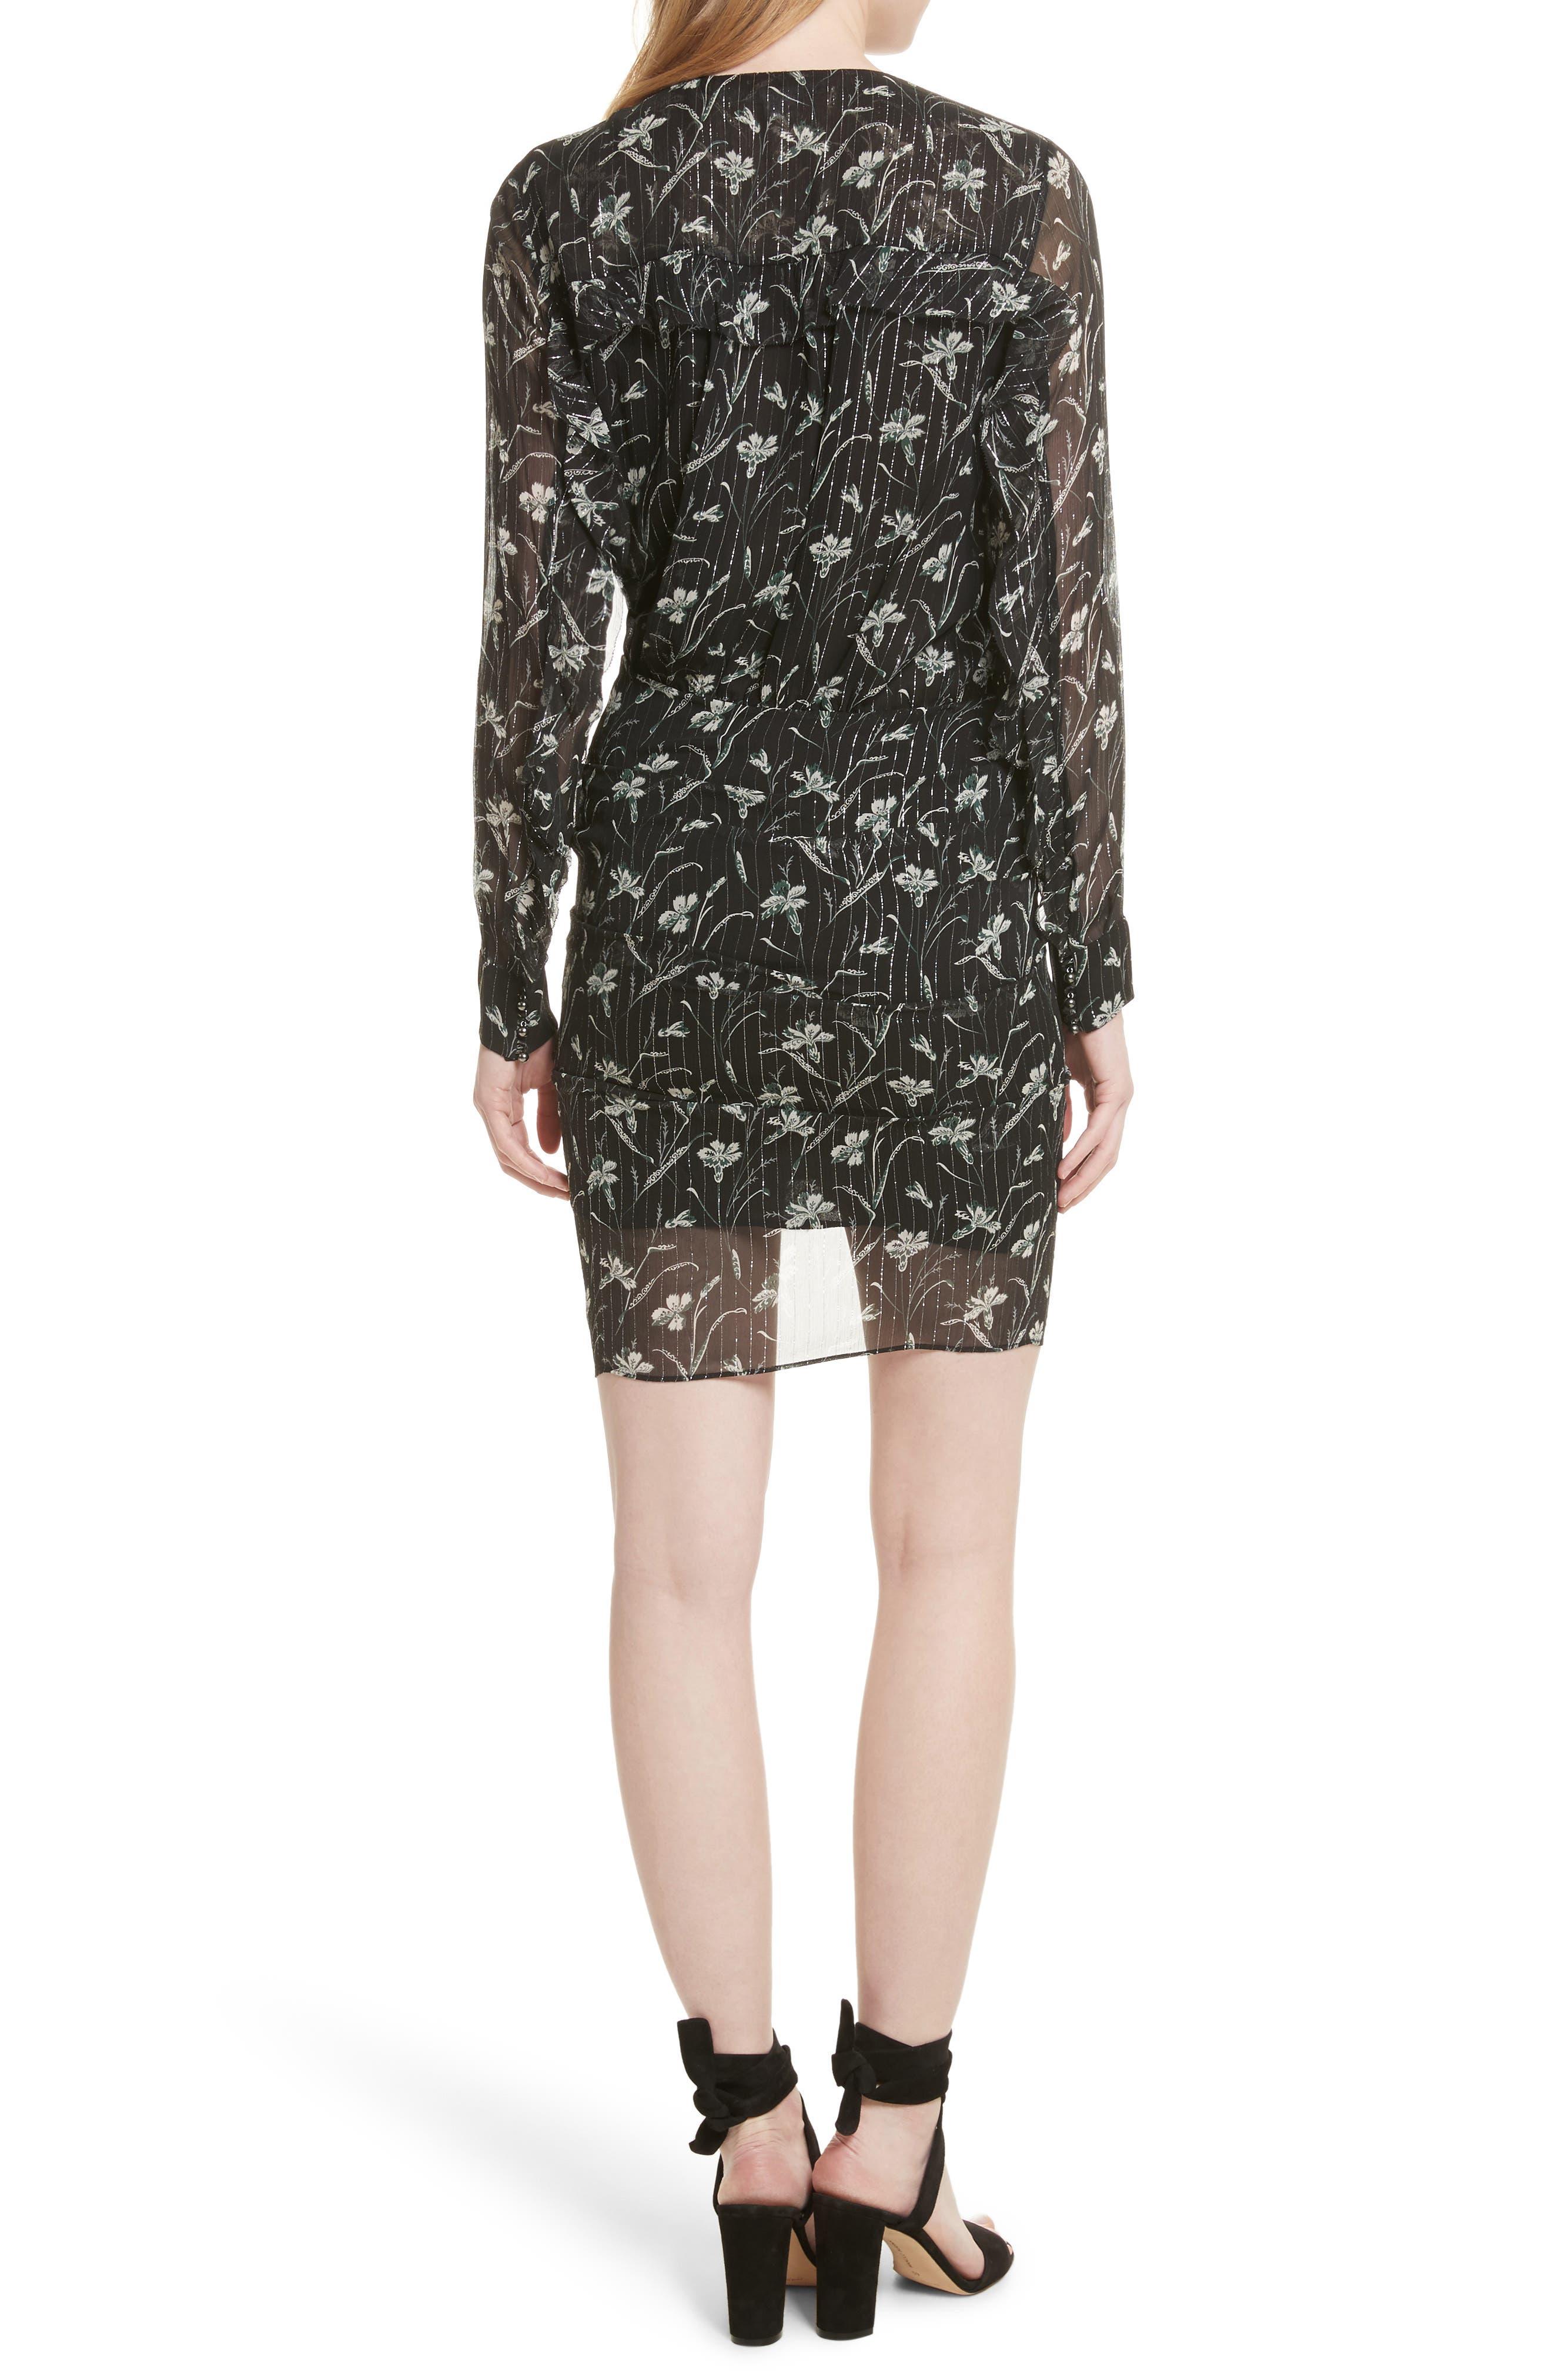 Fitzgerald Floral Print Metallic Chiffon Dress,                             Alternate thumbnail 2, color,                             Green/ Black